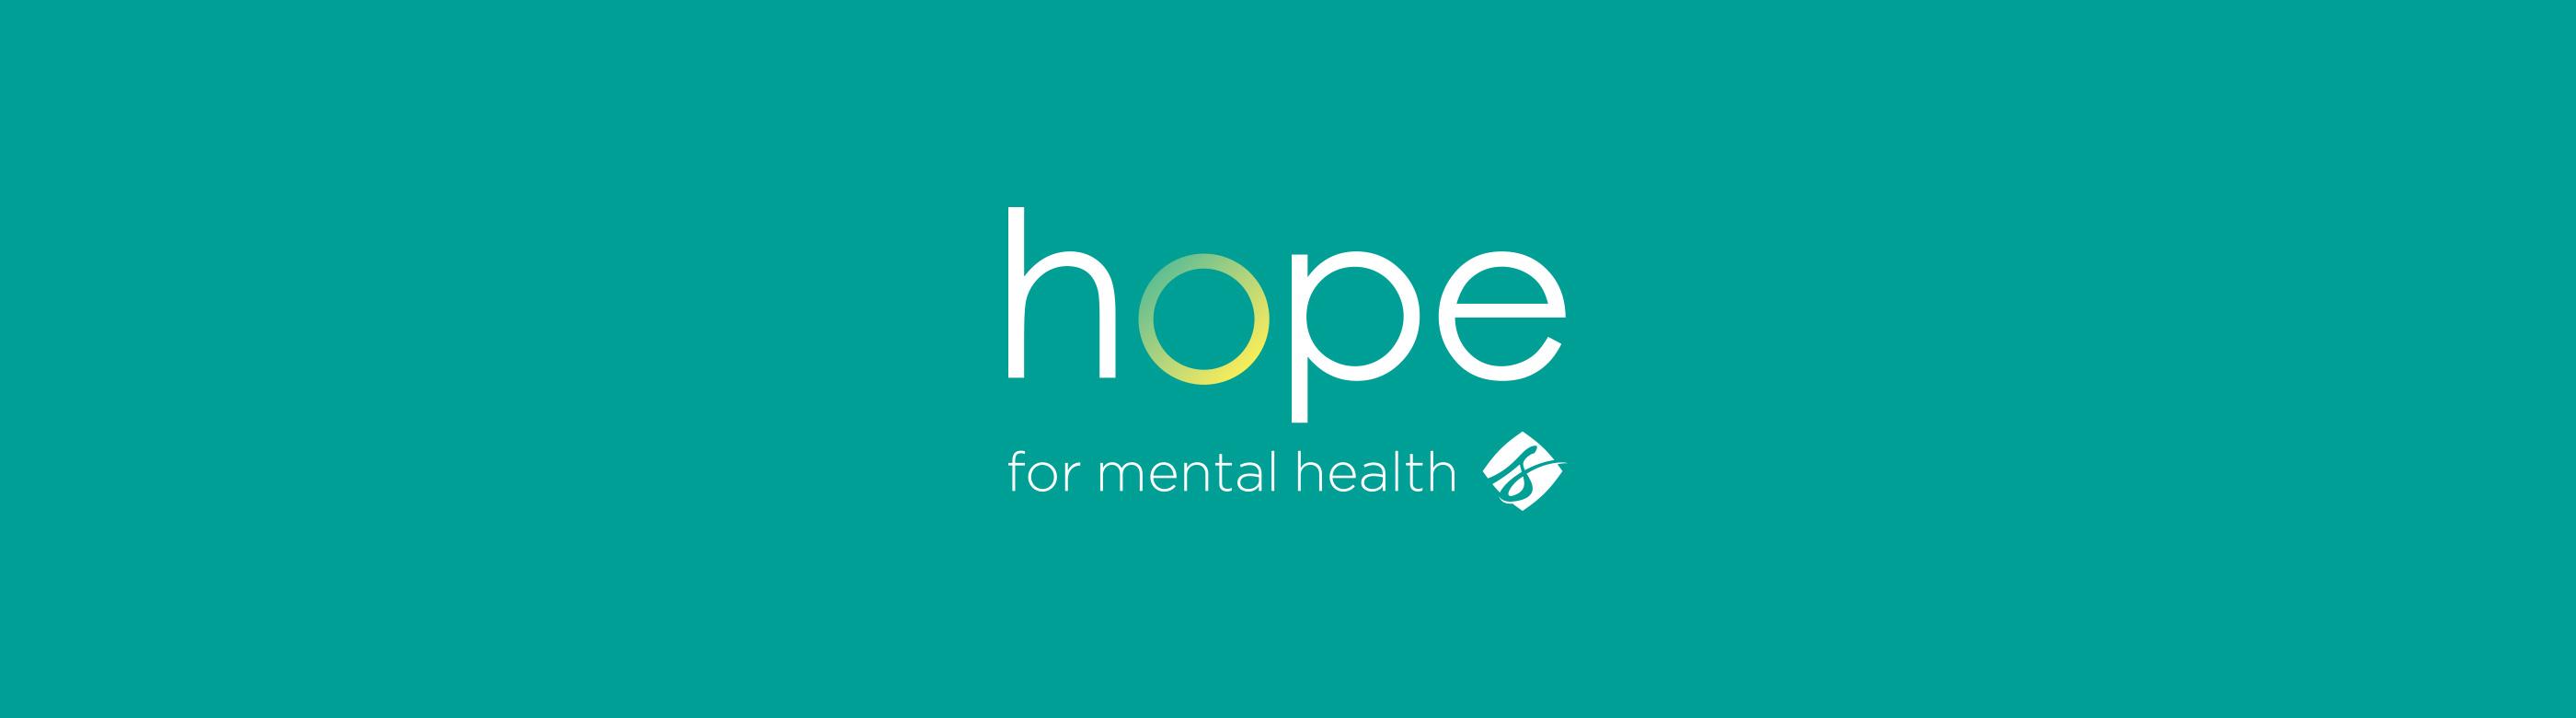 saddleback church ministries mental health ministry